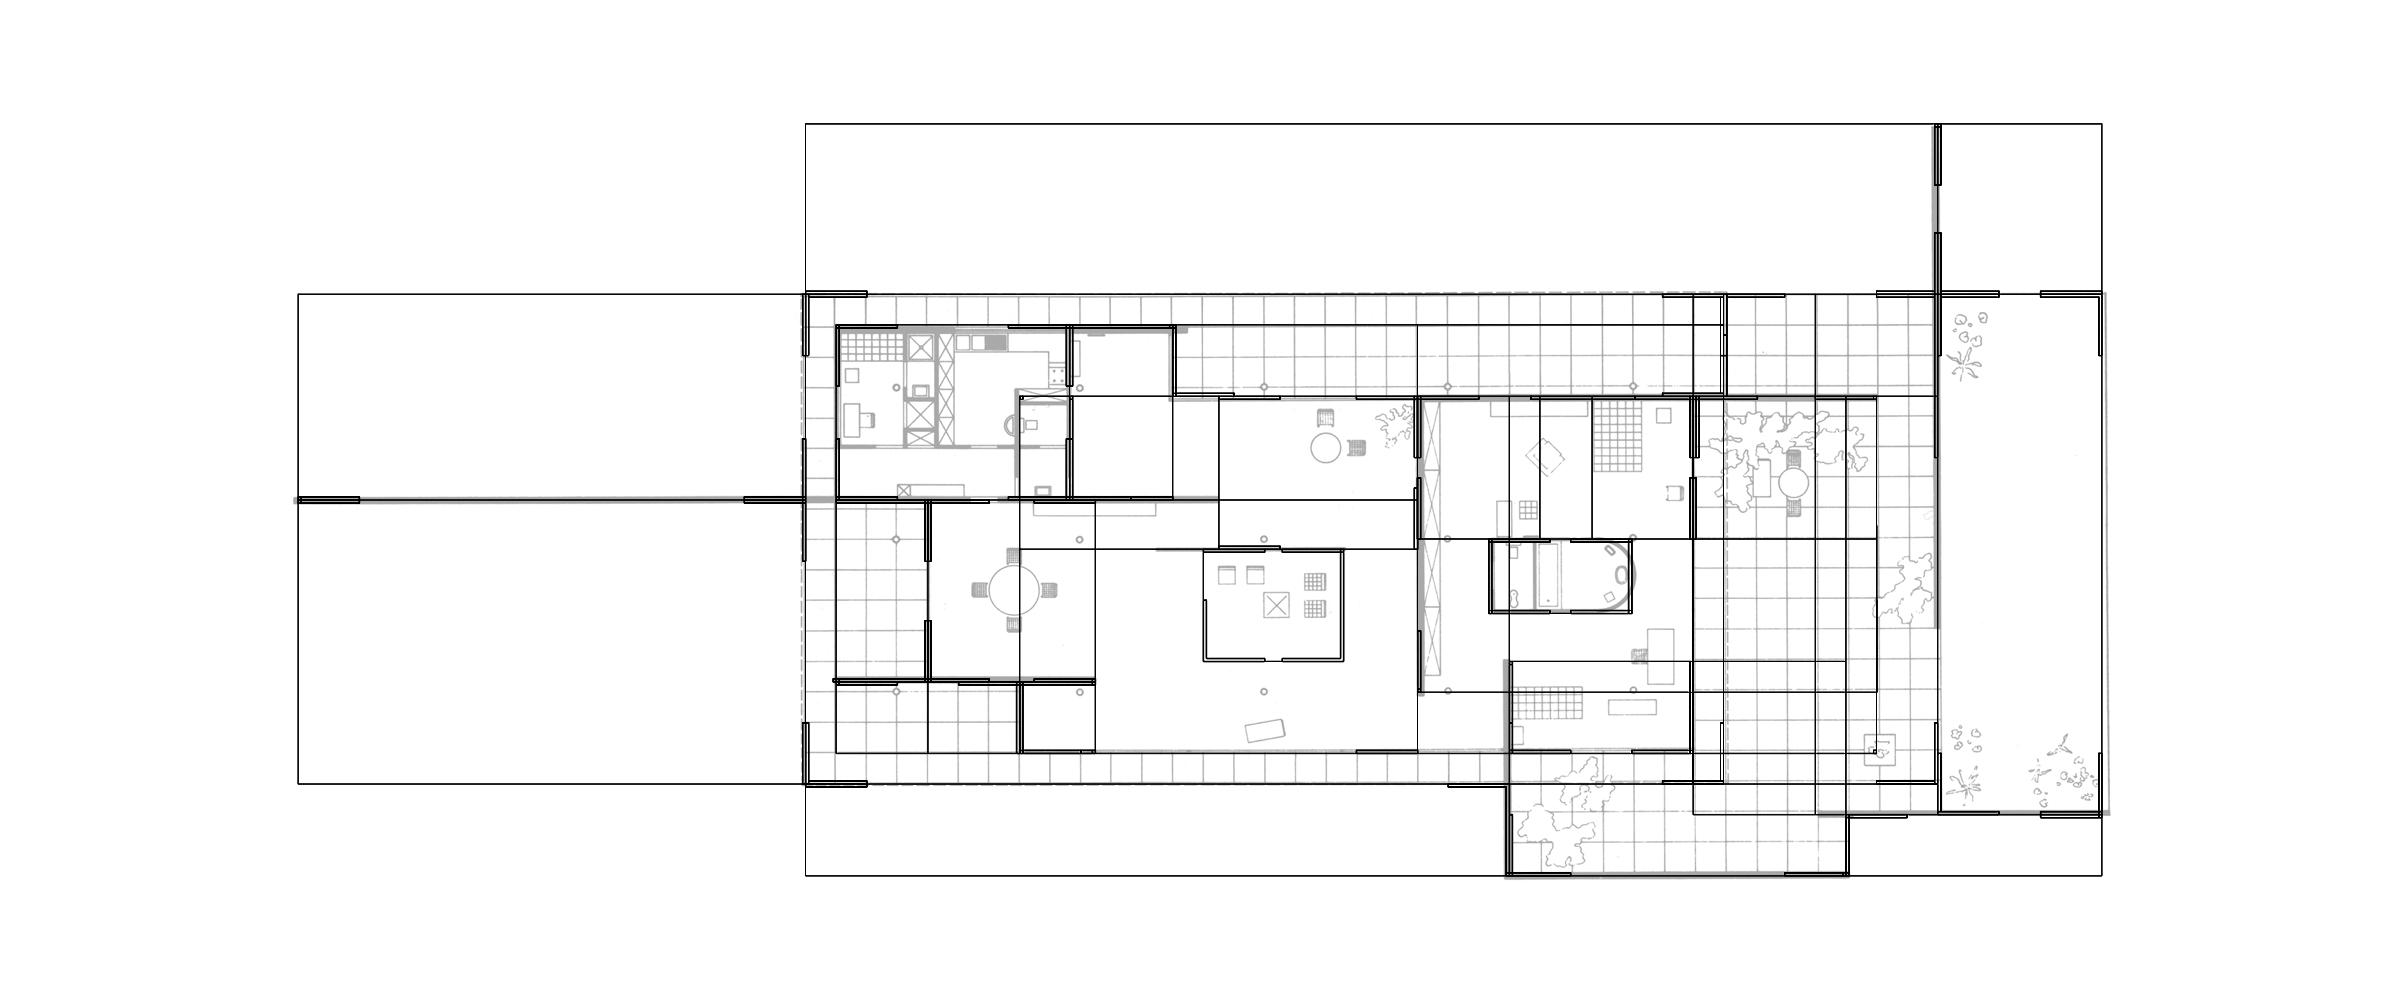 Mies Remix. Superimposed plans